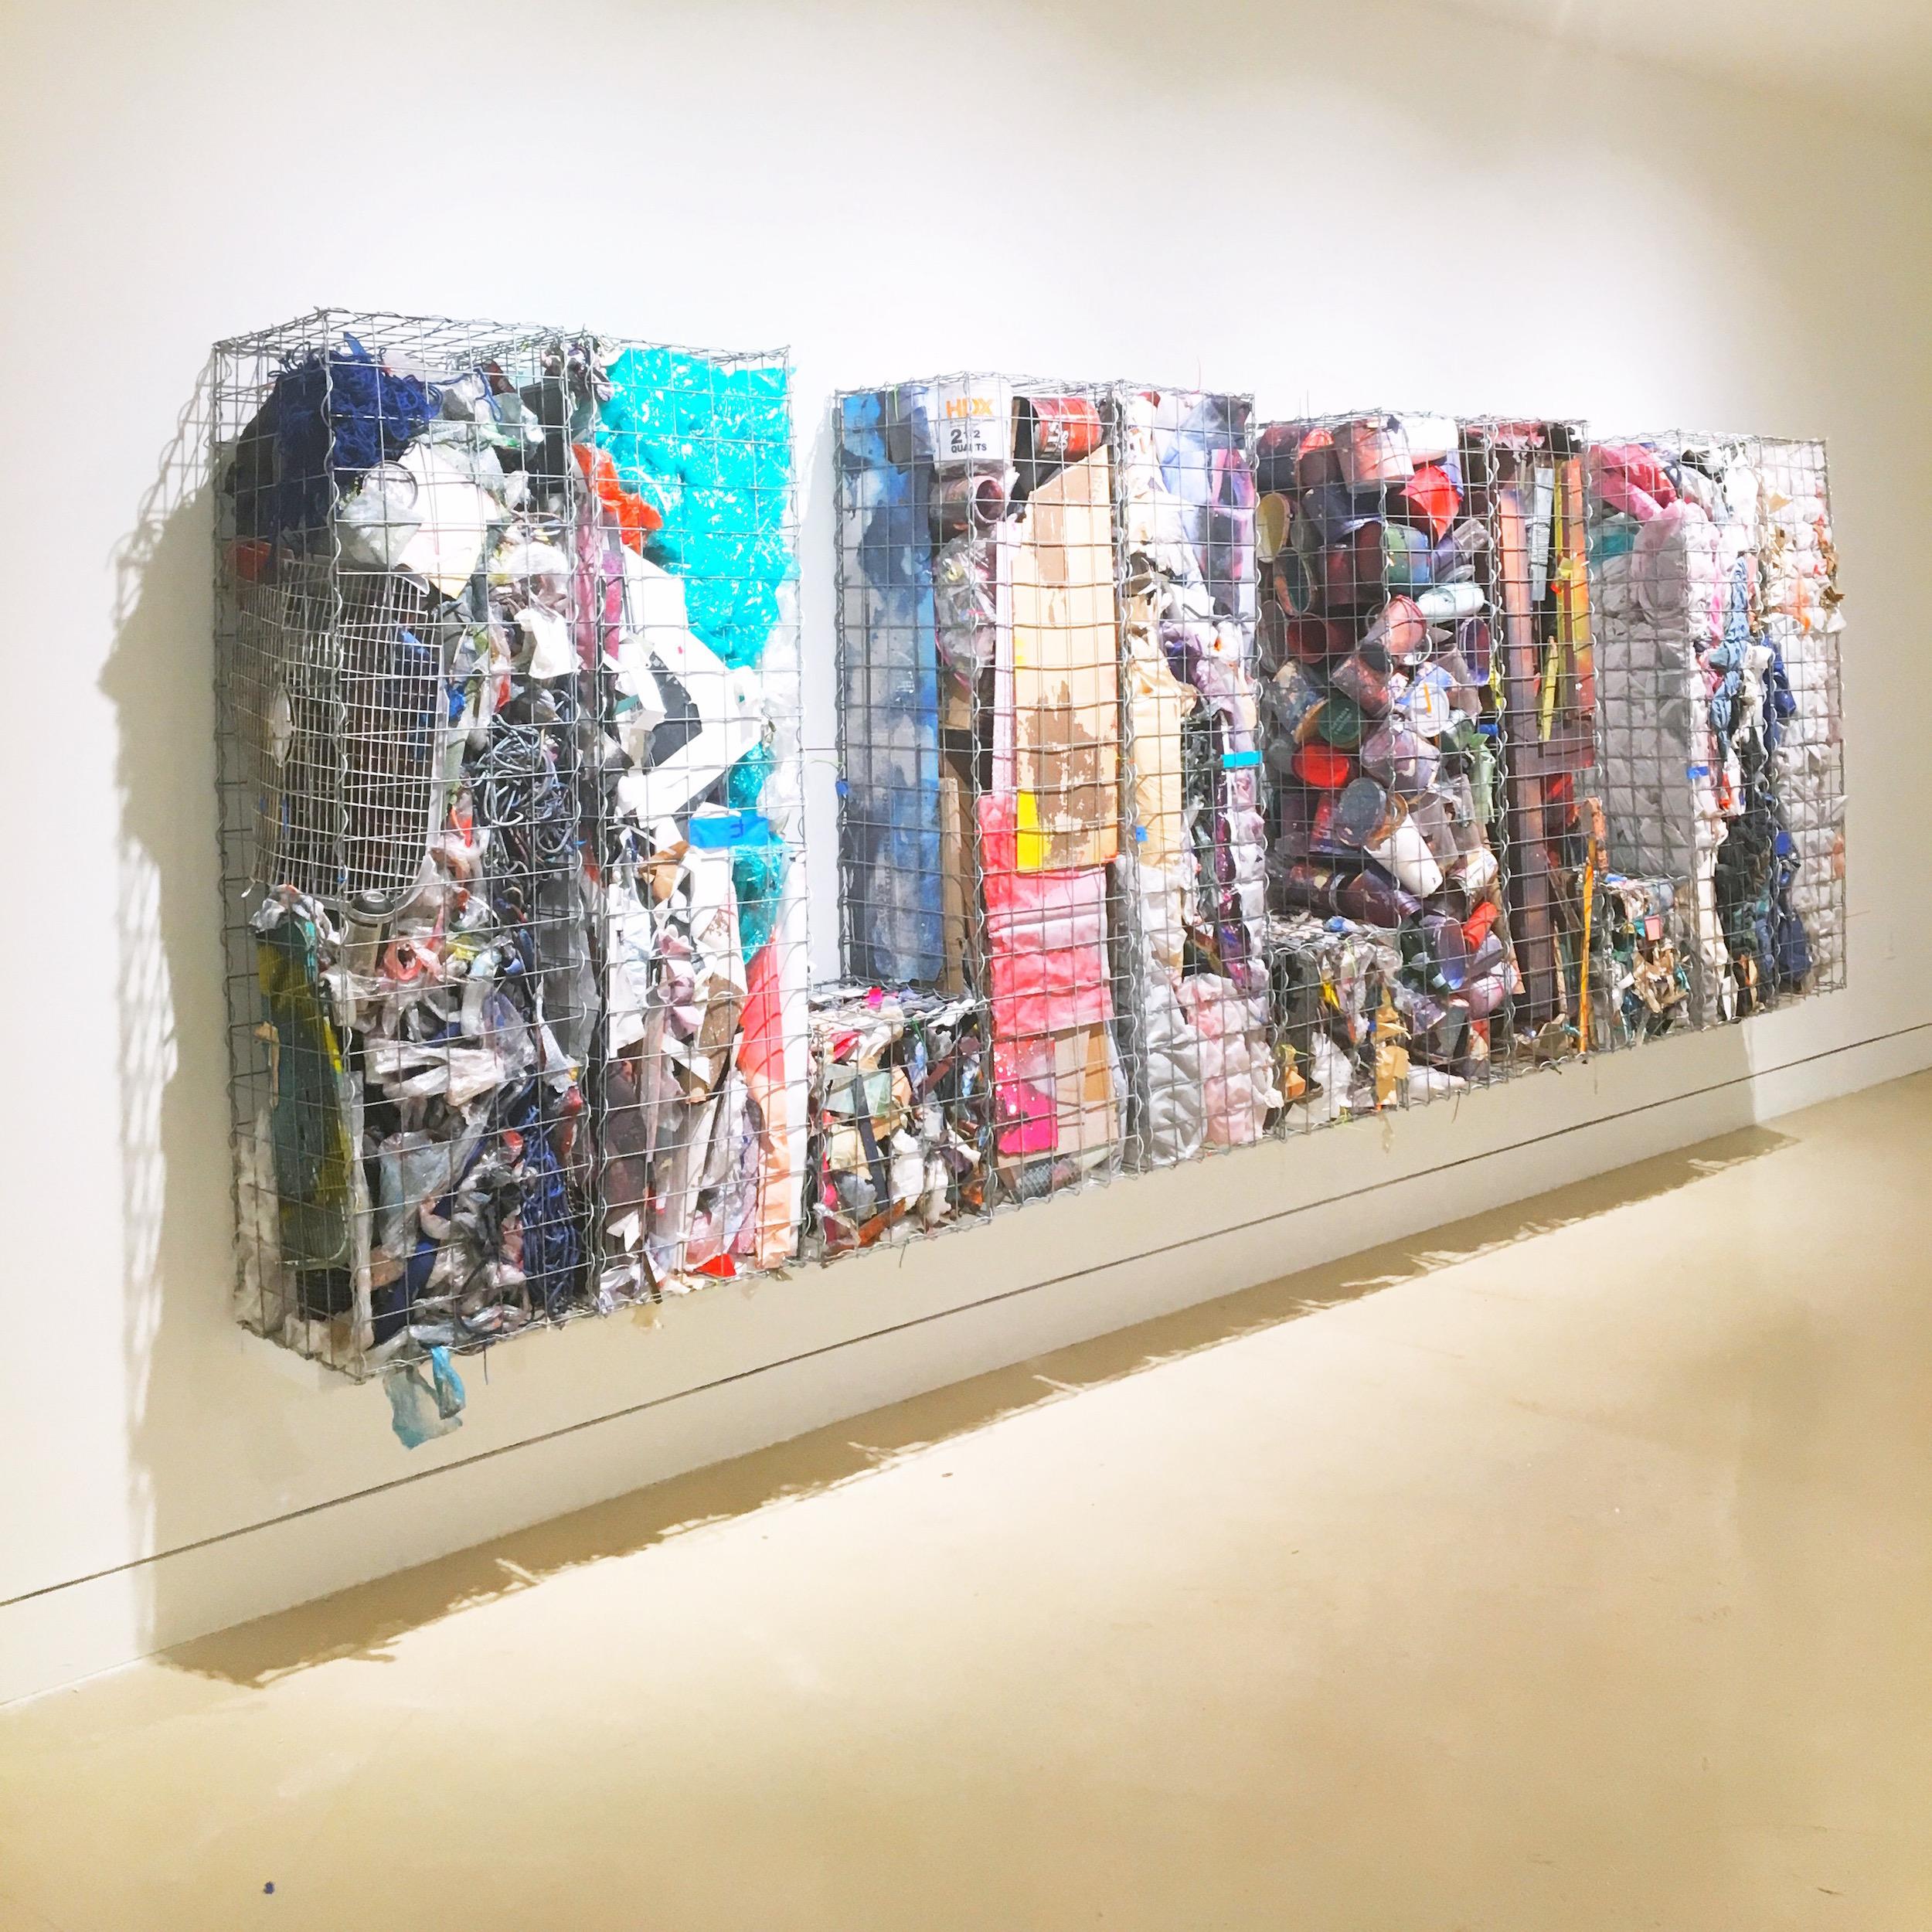 IAIN MUIRHEAD   18161:18172  , 2014-2018. Gabion baskets, zip ties, aggregate studio material. 60 x 174 x 16 inches. Installation view Torrance Art Museum.